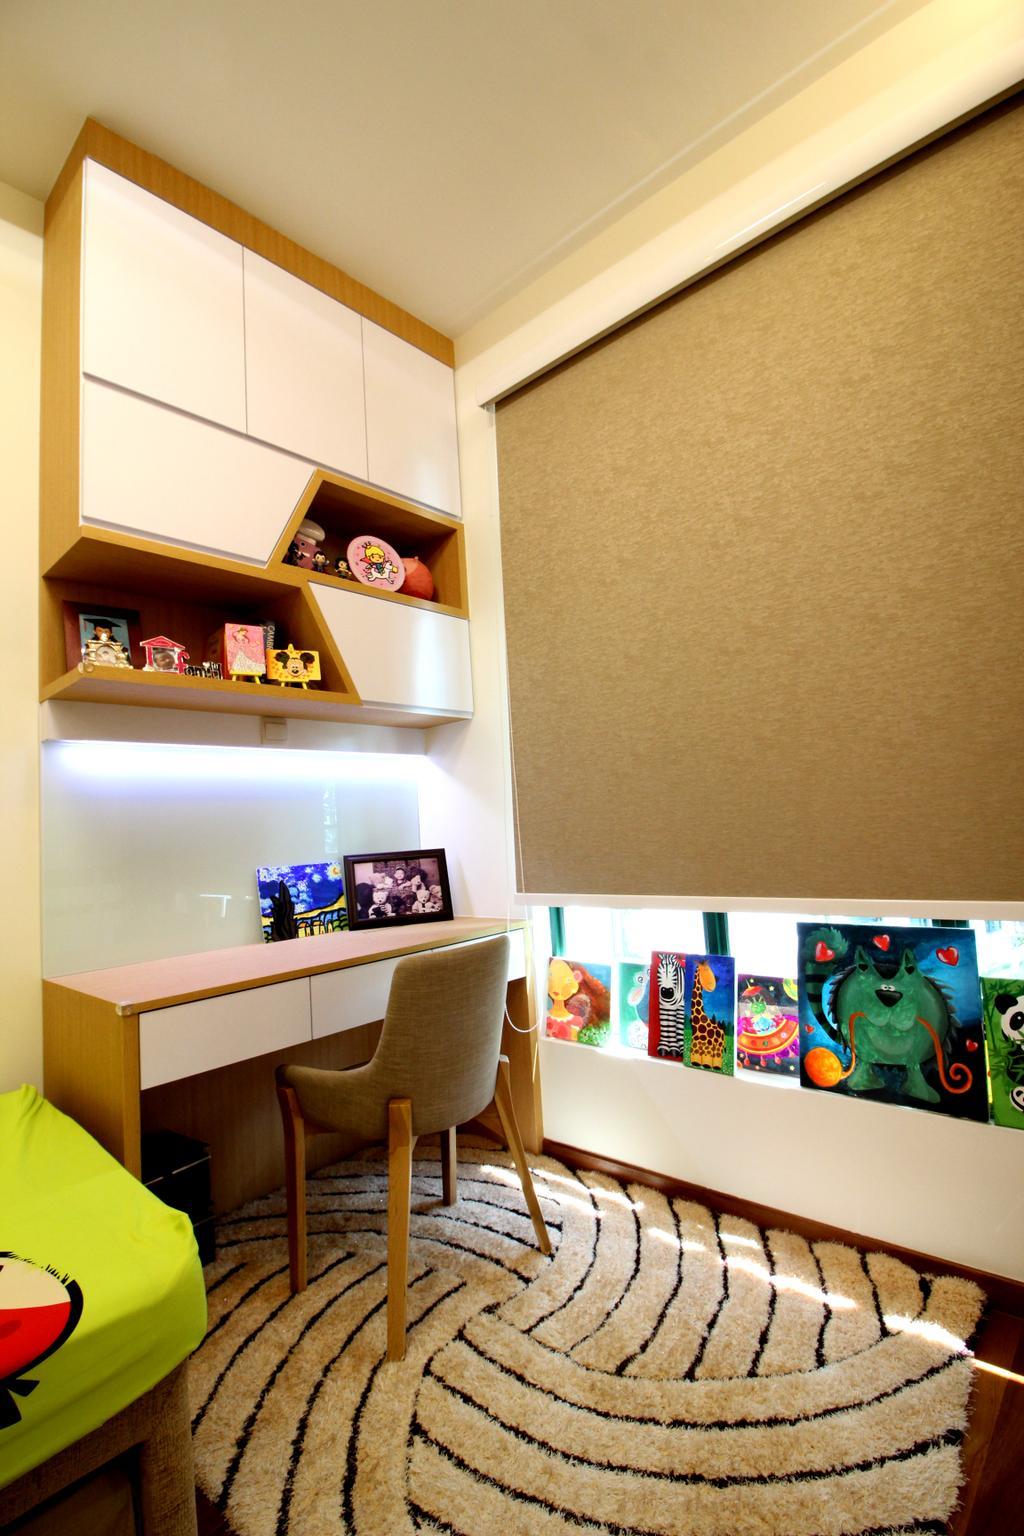 Condo, Parc Palais, Interior Designer, Aestherior, Shelf, Human, People, Person, Desk, Furniture, Table, Bookcase